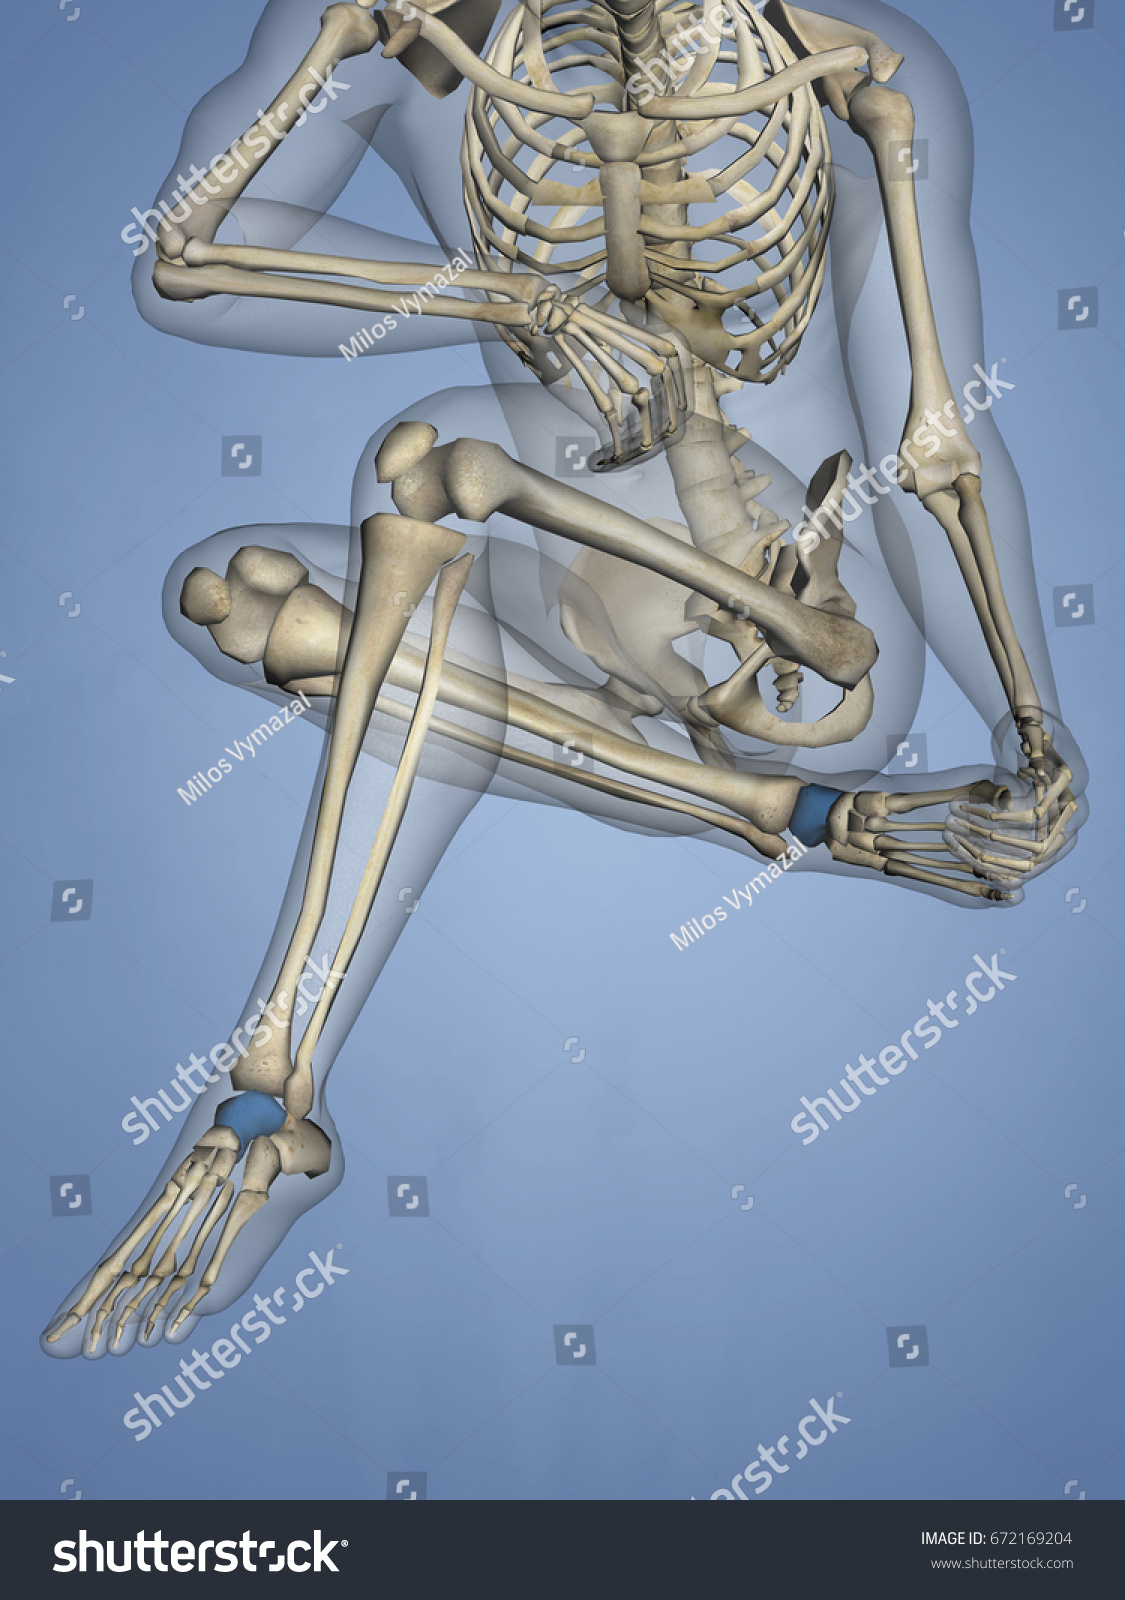 Talus Bone 3 D Model Stock Illustration 672169204 - Shutterstock